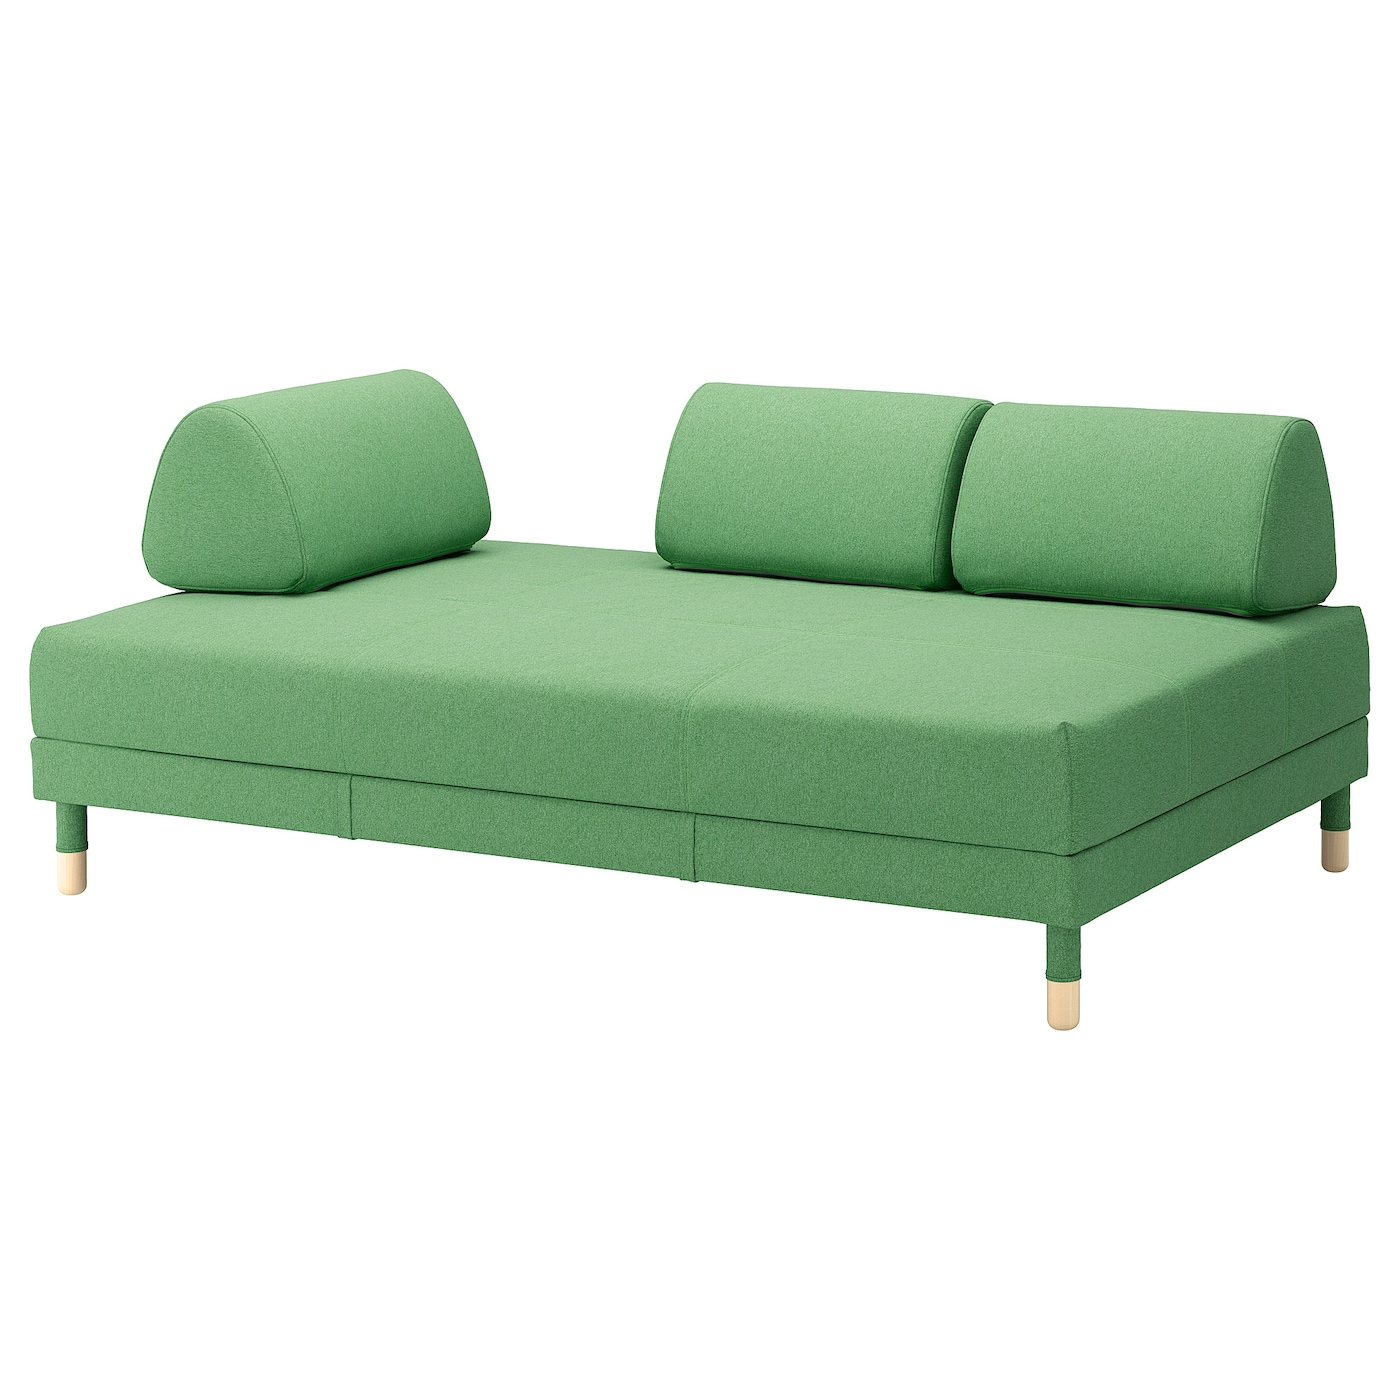 Futon Sofa Ikea corner sofa beds futons chair beds ikea